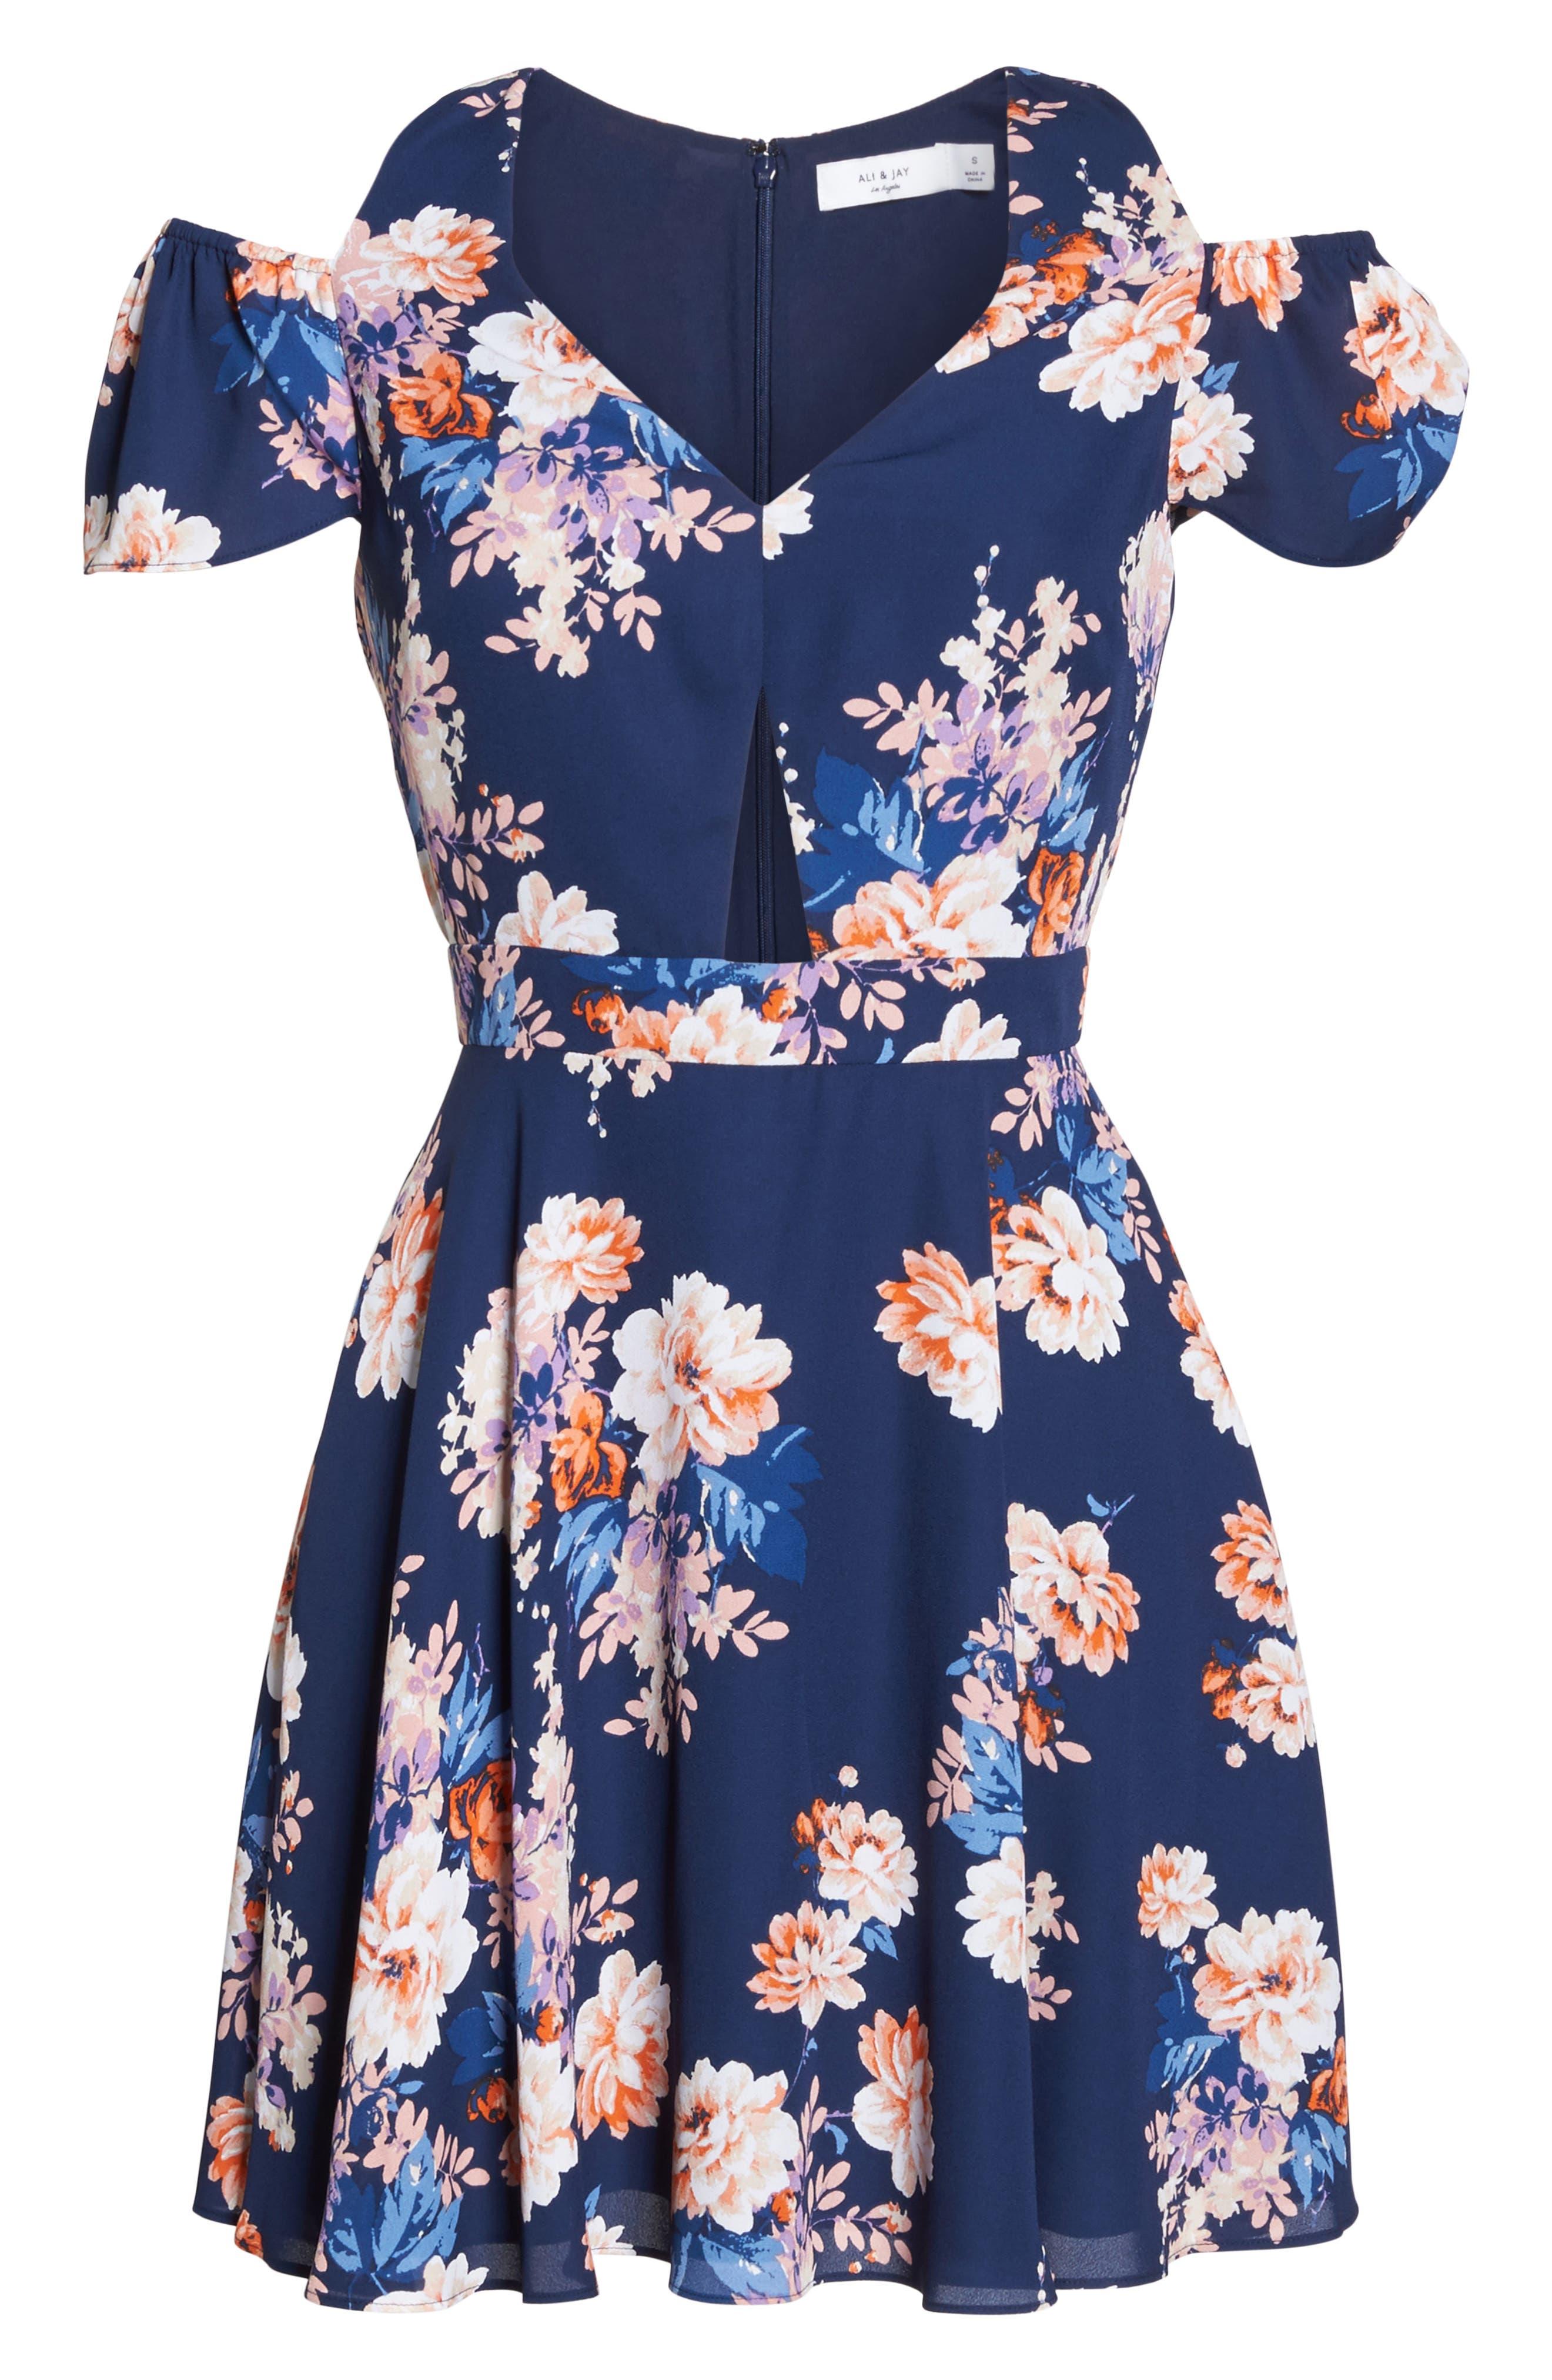 Chasing Butterflies Cold Shoulder Fit & Flare Dress,                             Alternate thumbnail 6, color,                             400